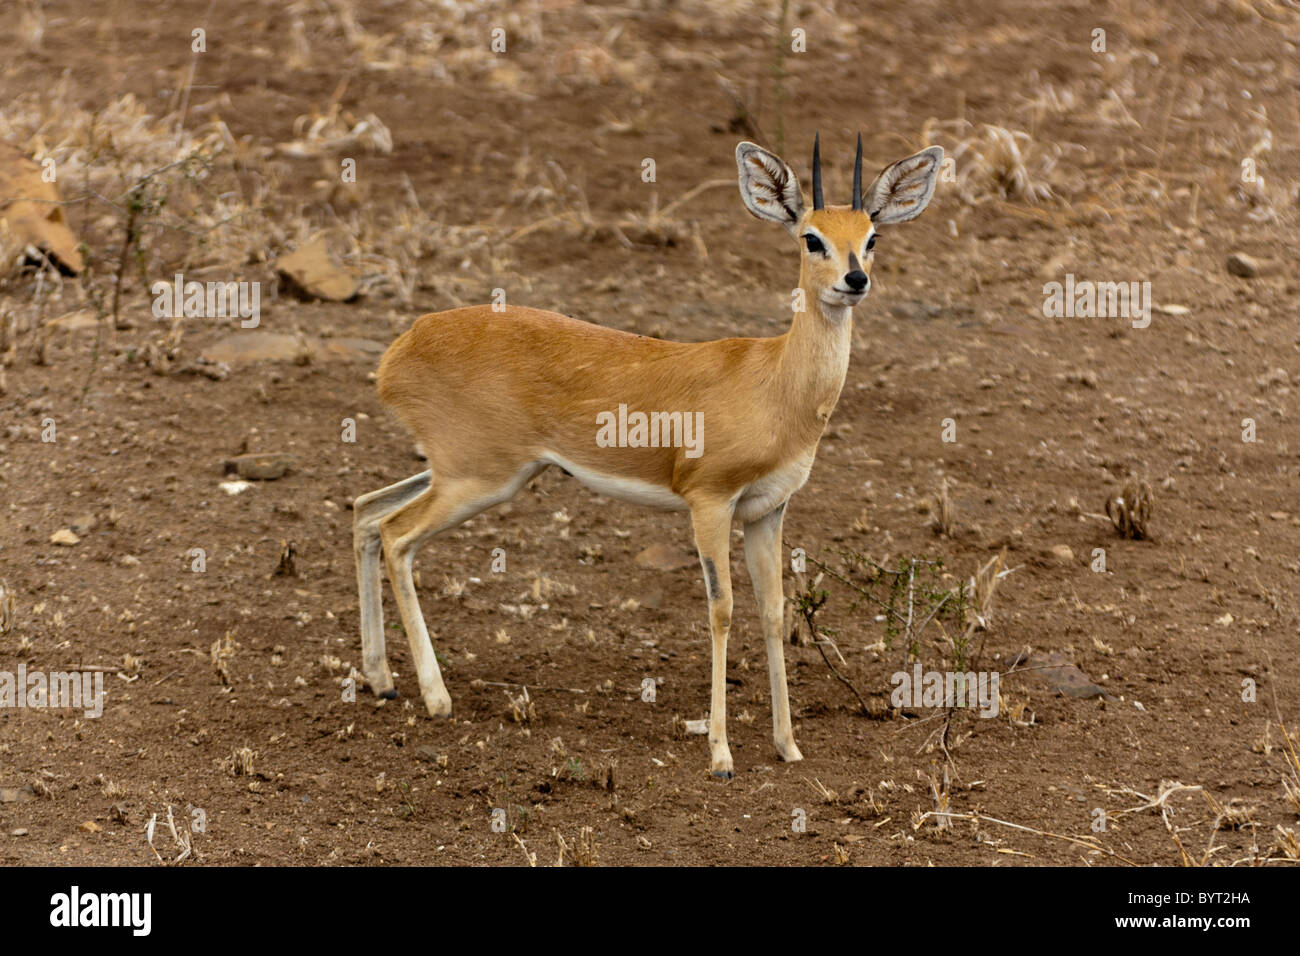 Cefalofo comune, wild timida antelope Immagini Stock